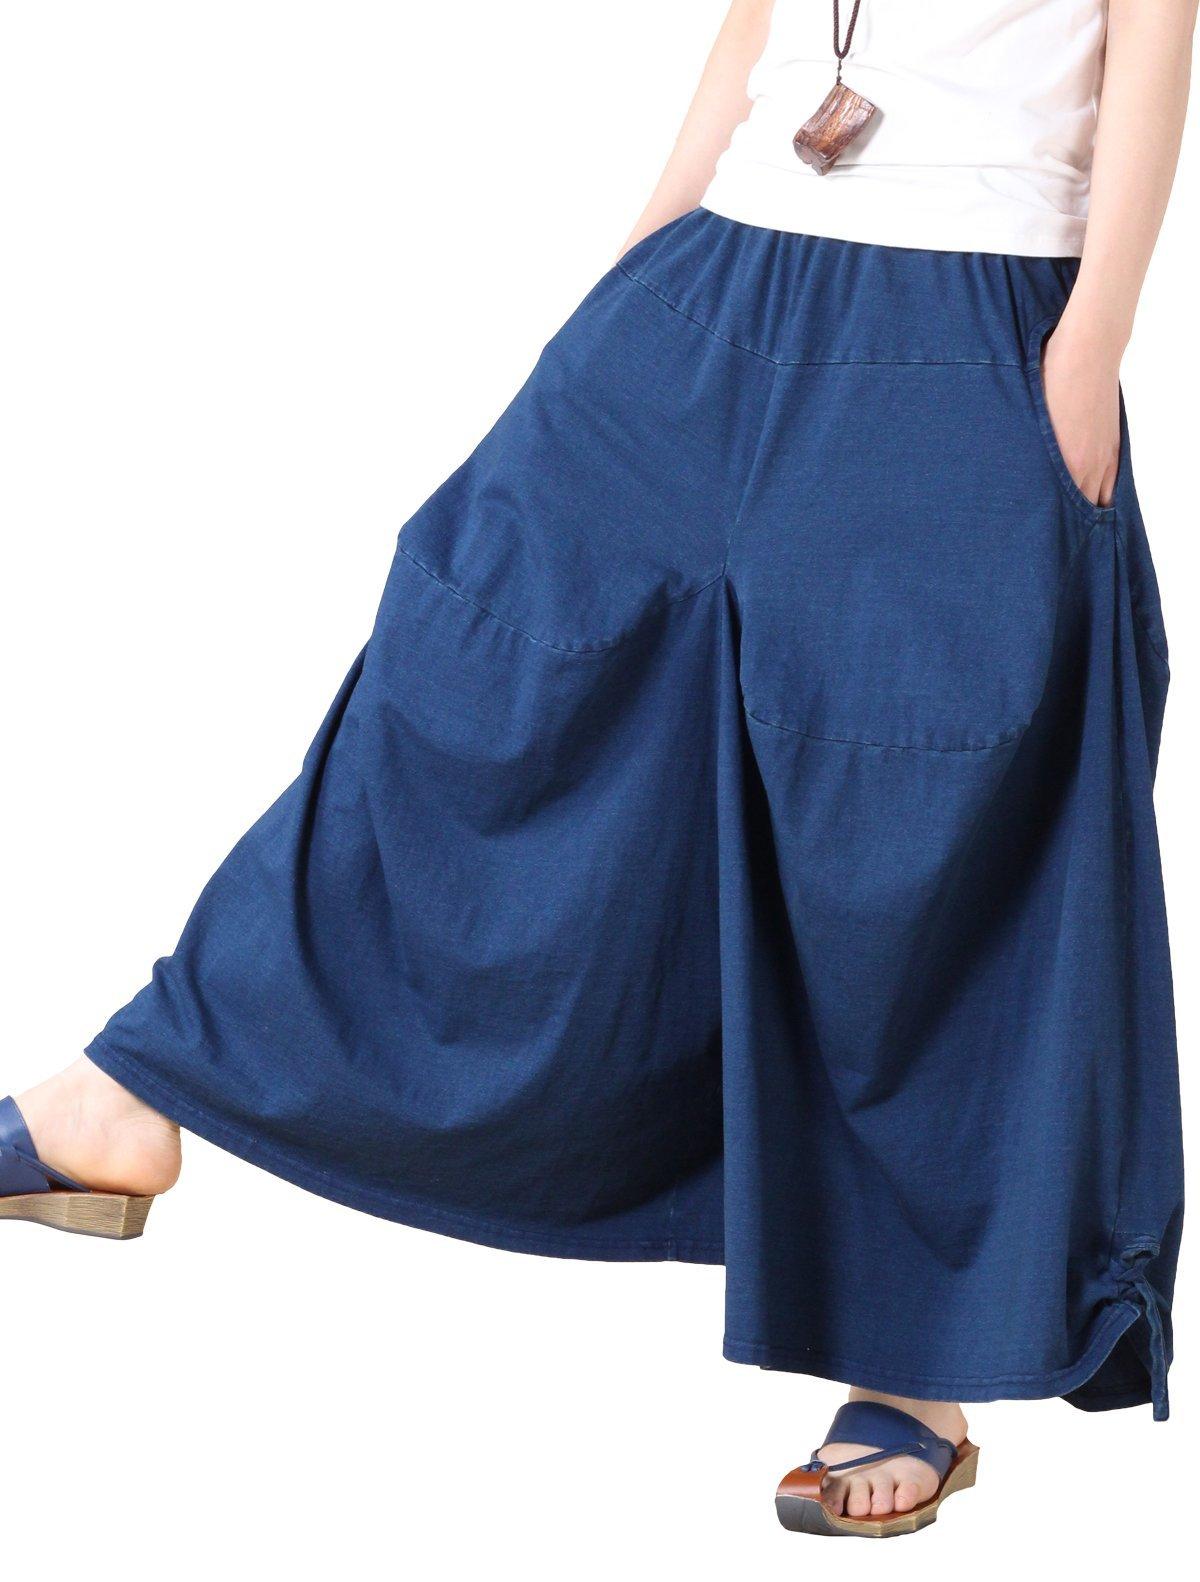 Mordenmiss Women's New Casual Wide Leg Pants Side Pockets Denim Haren Pants (L, Style 9-Blue)